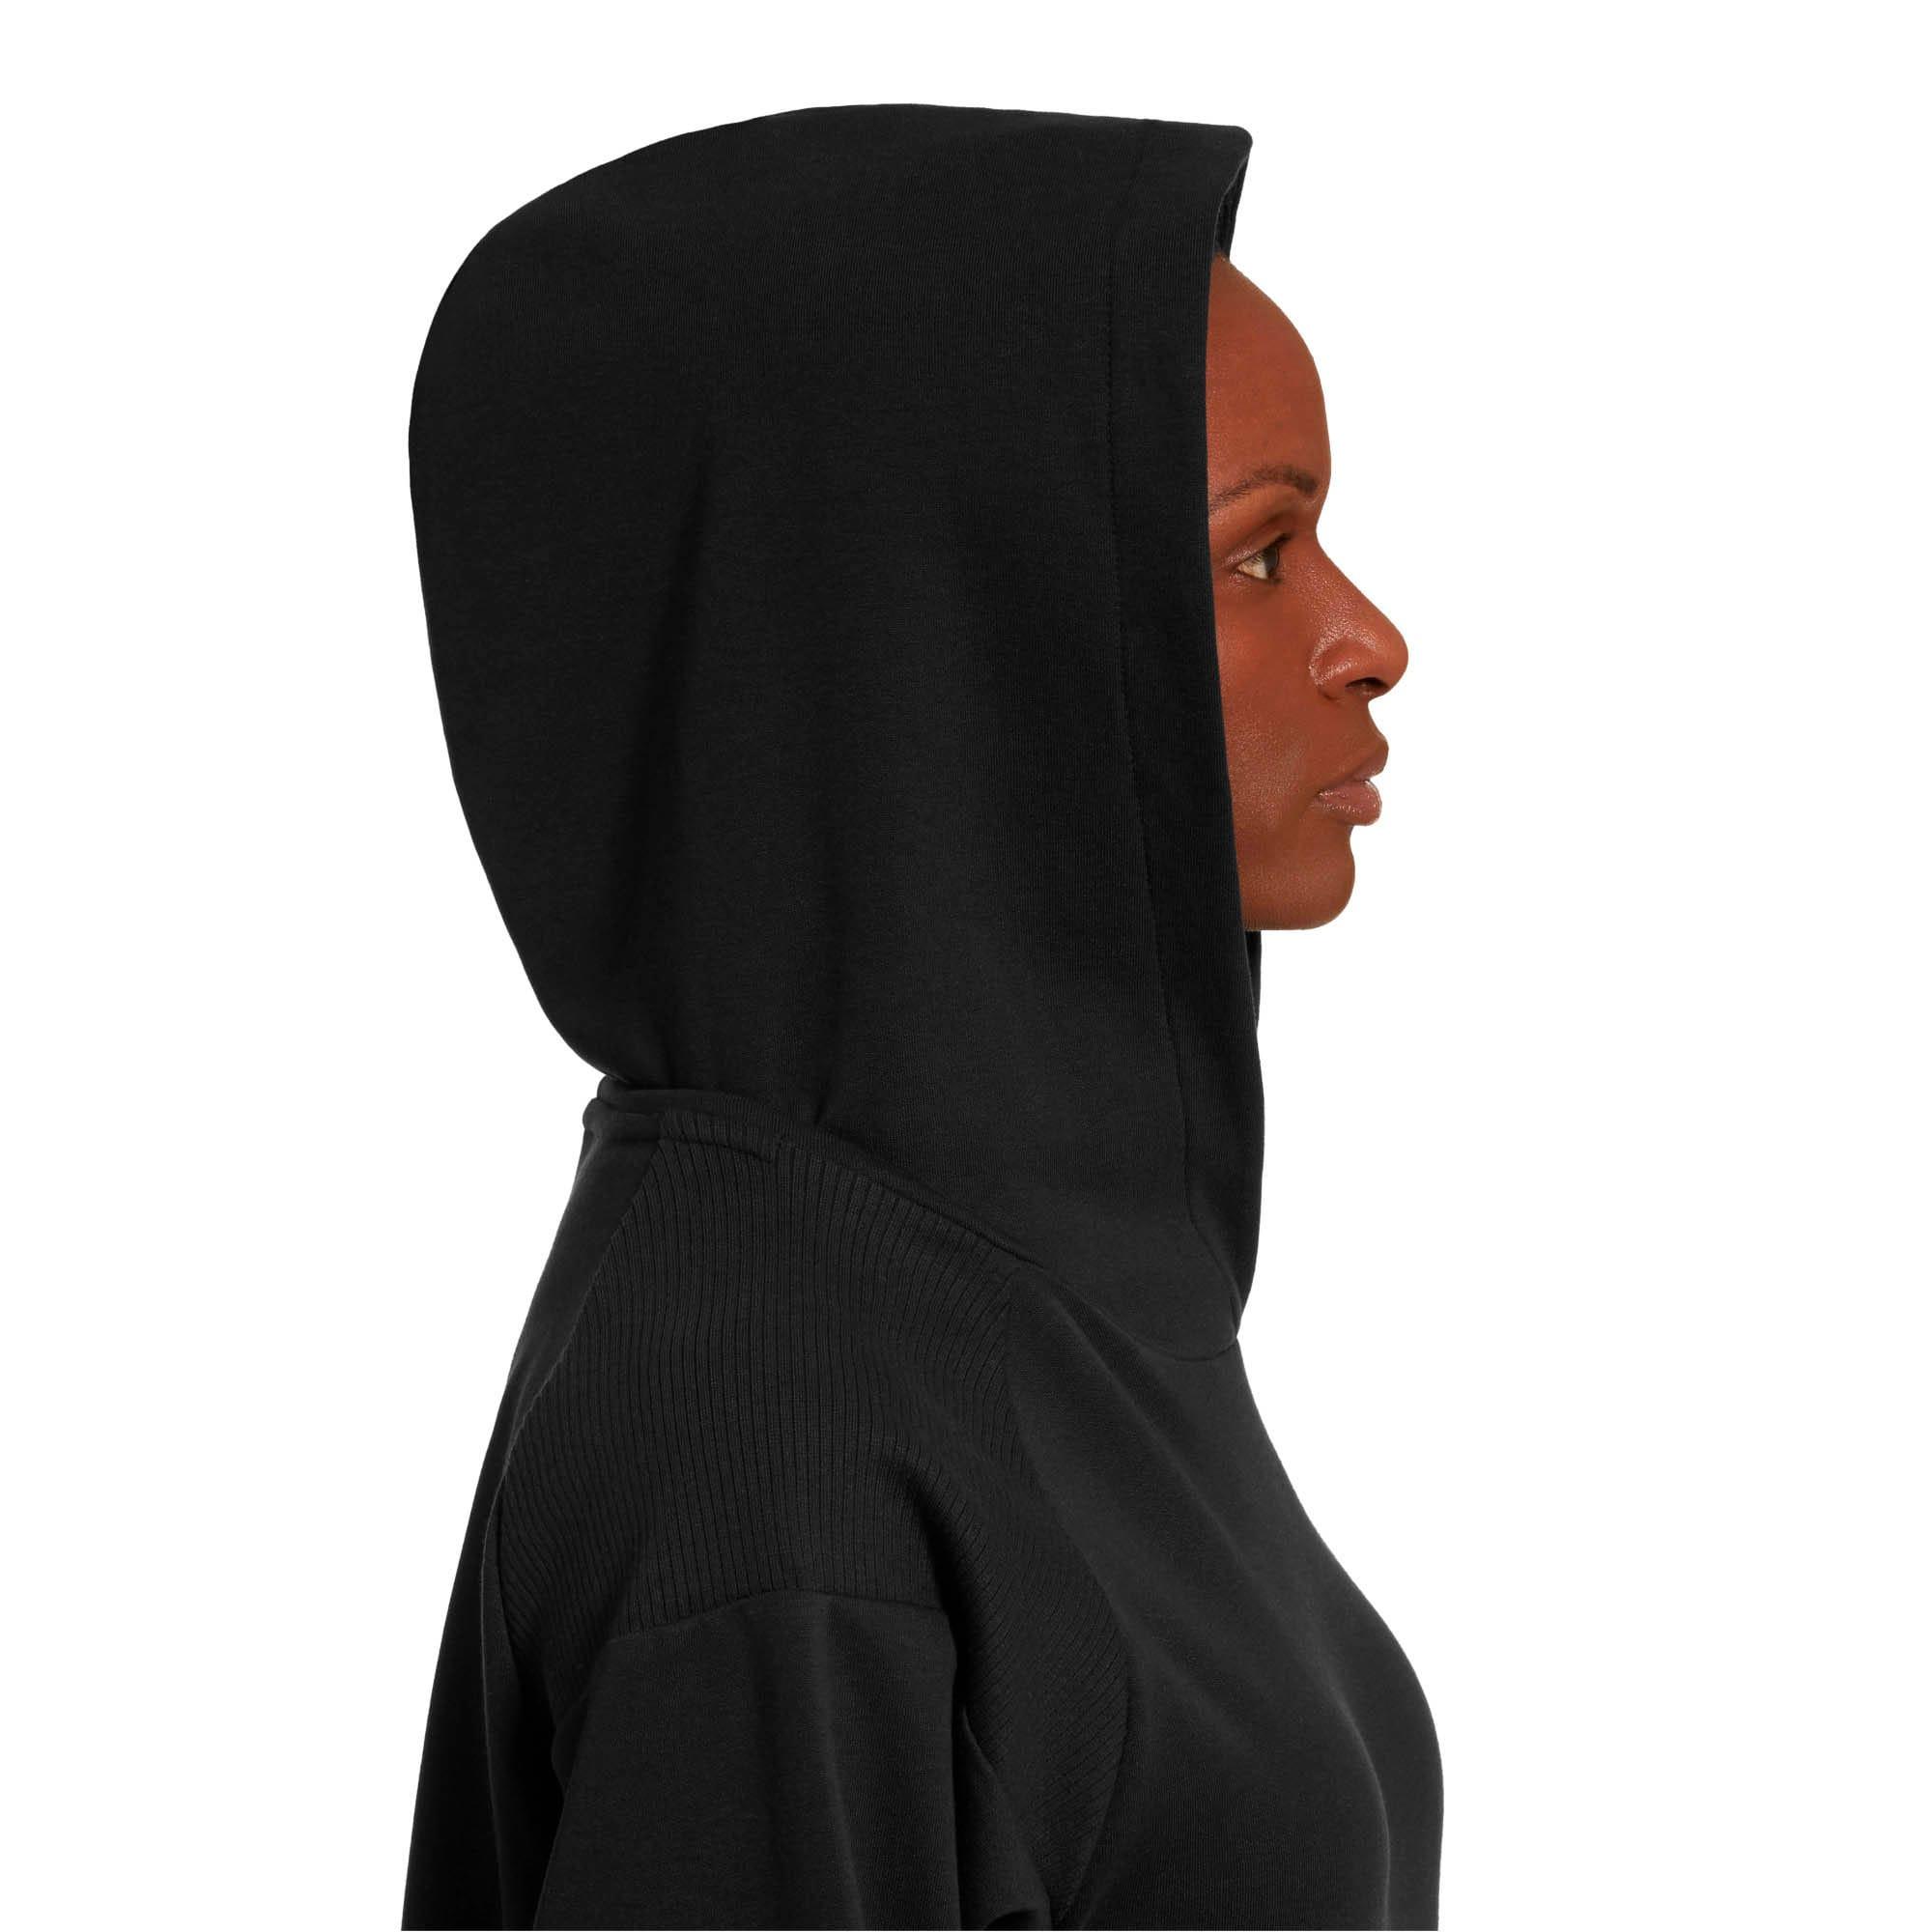 Thumbnail 4 of Fusion Women's Hoodie, Cotton Black, medium